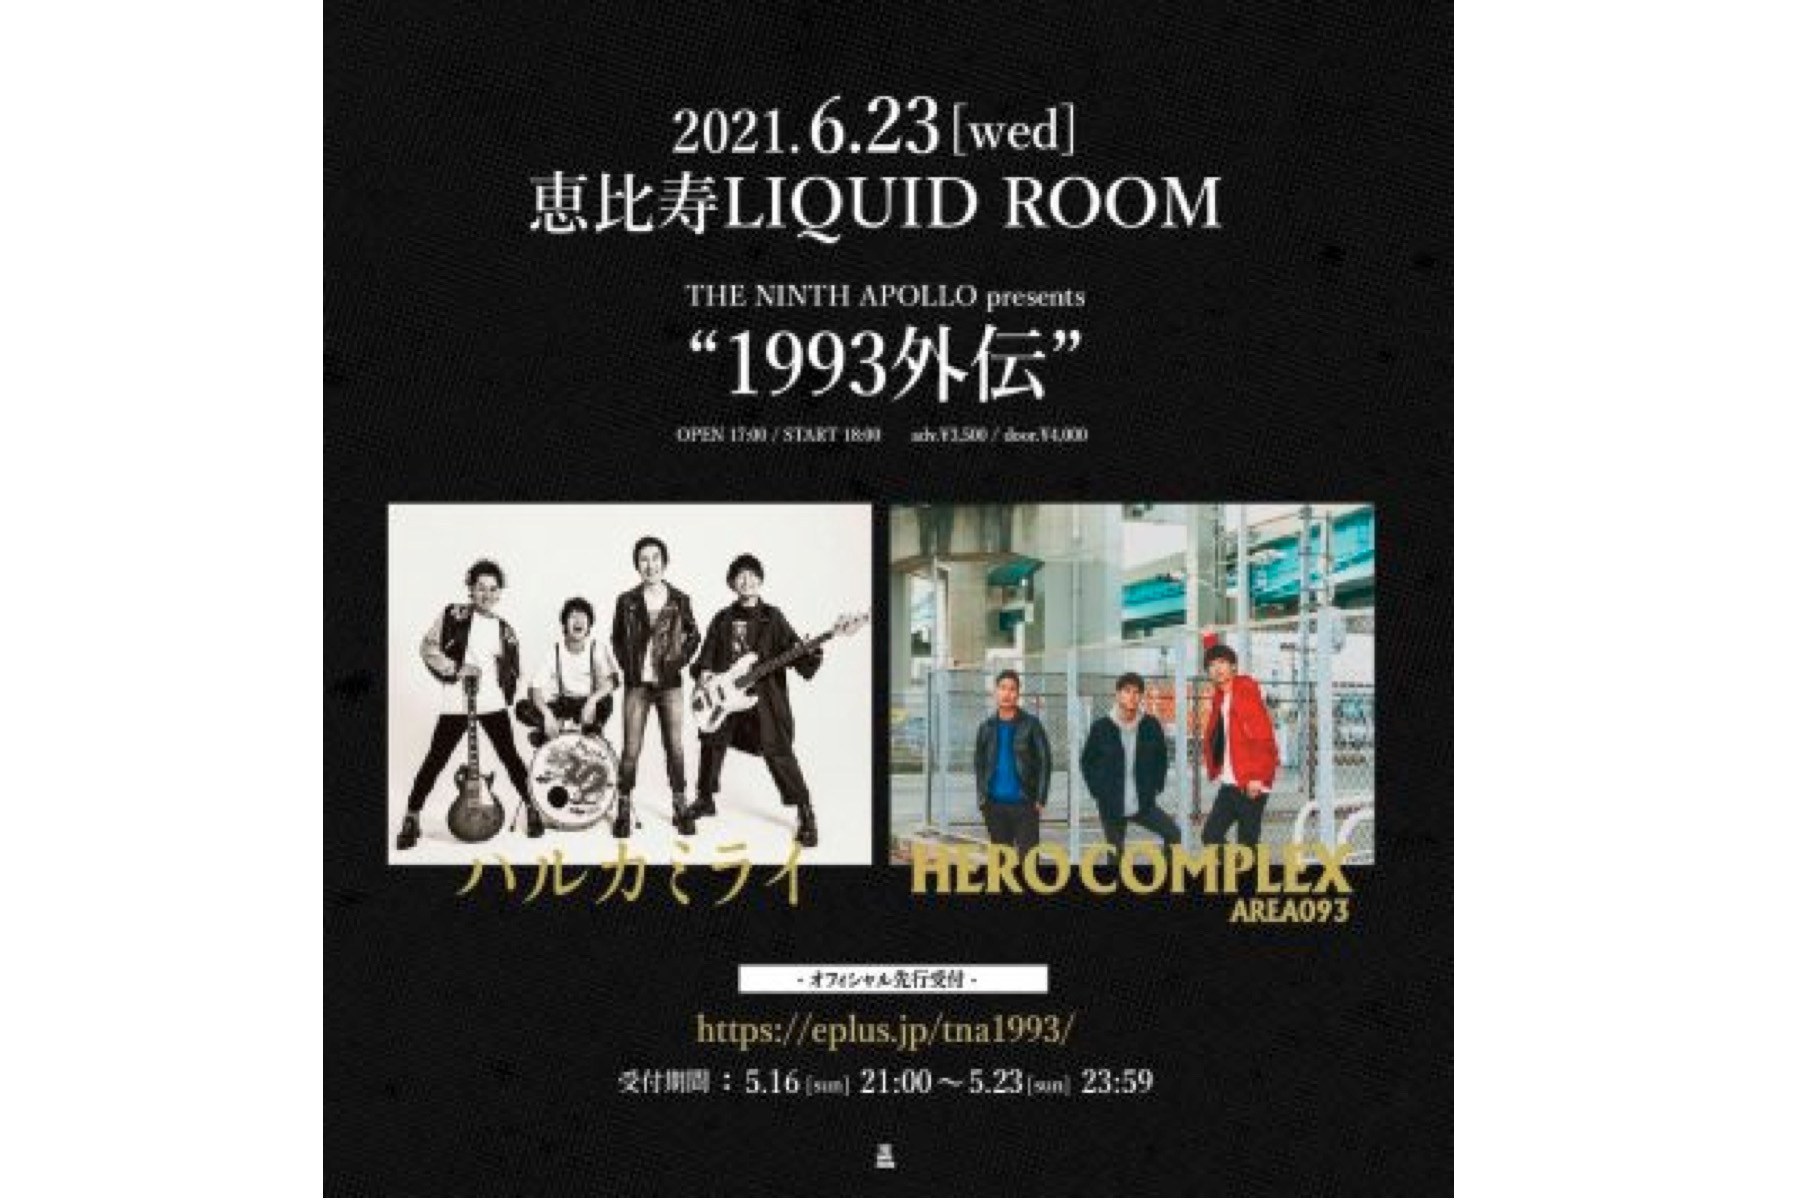 6.23 Wed.ハルカミライ/ HERO COMPLEX